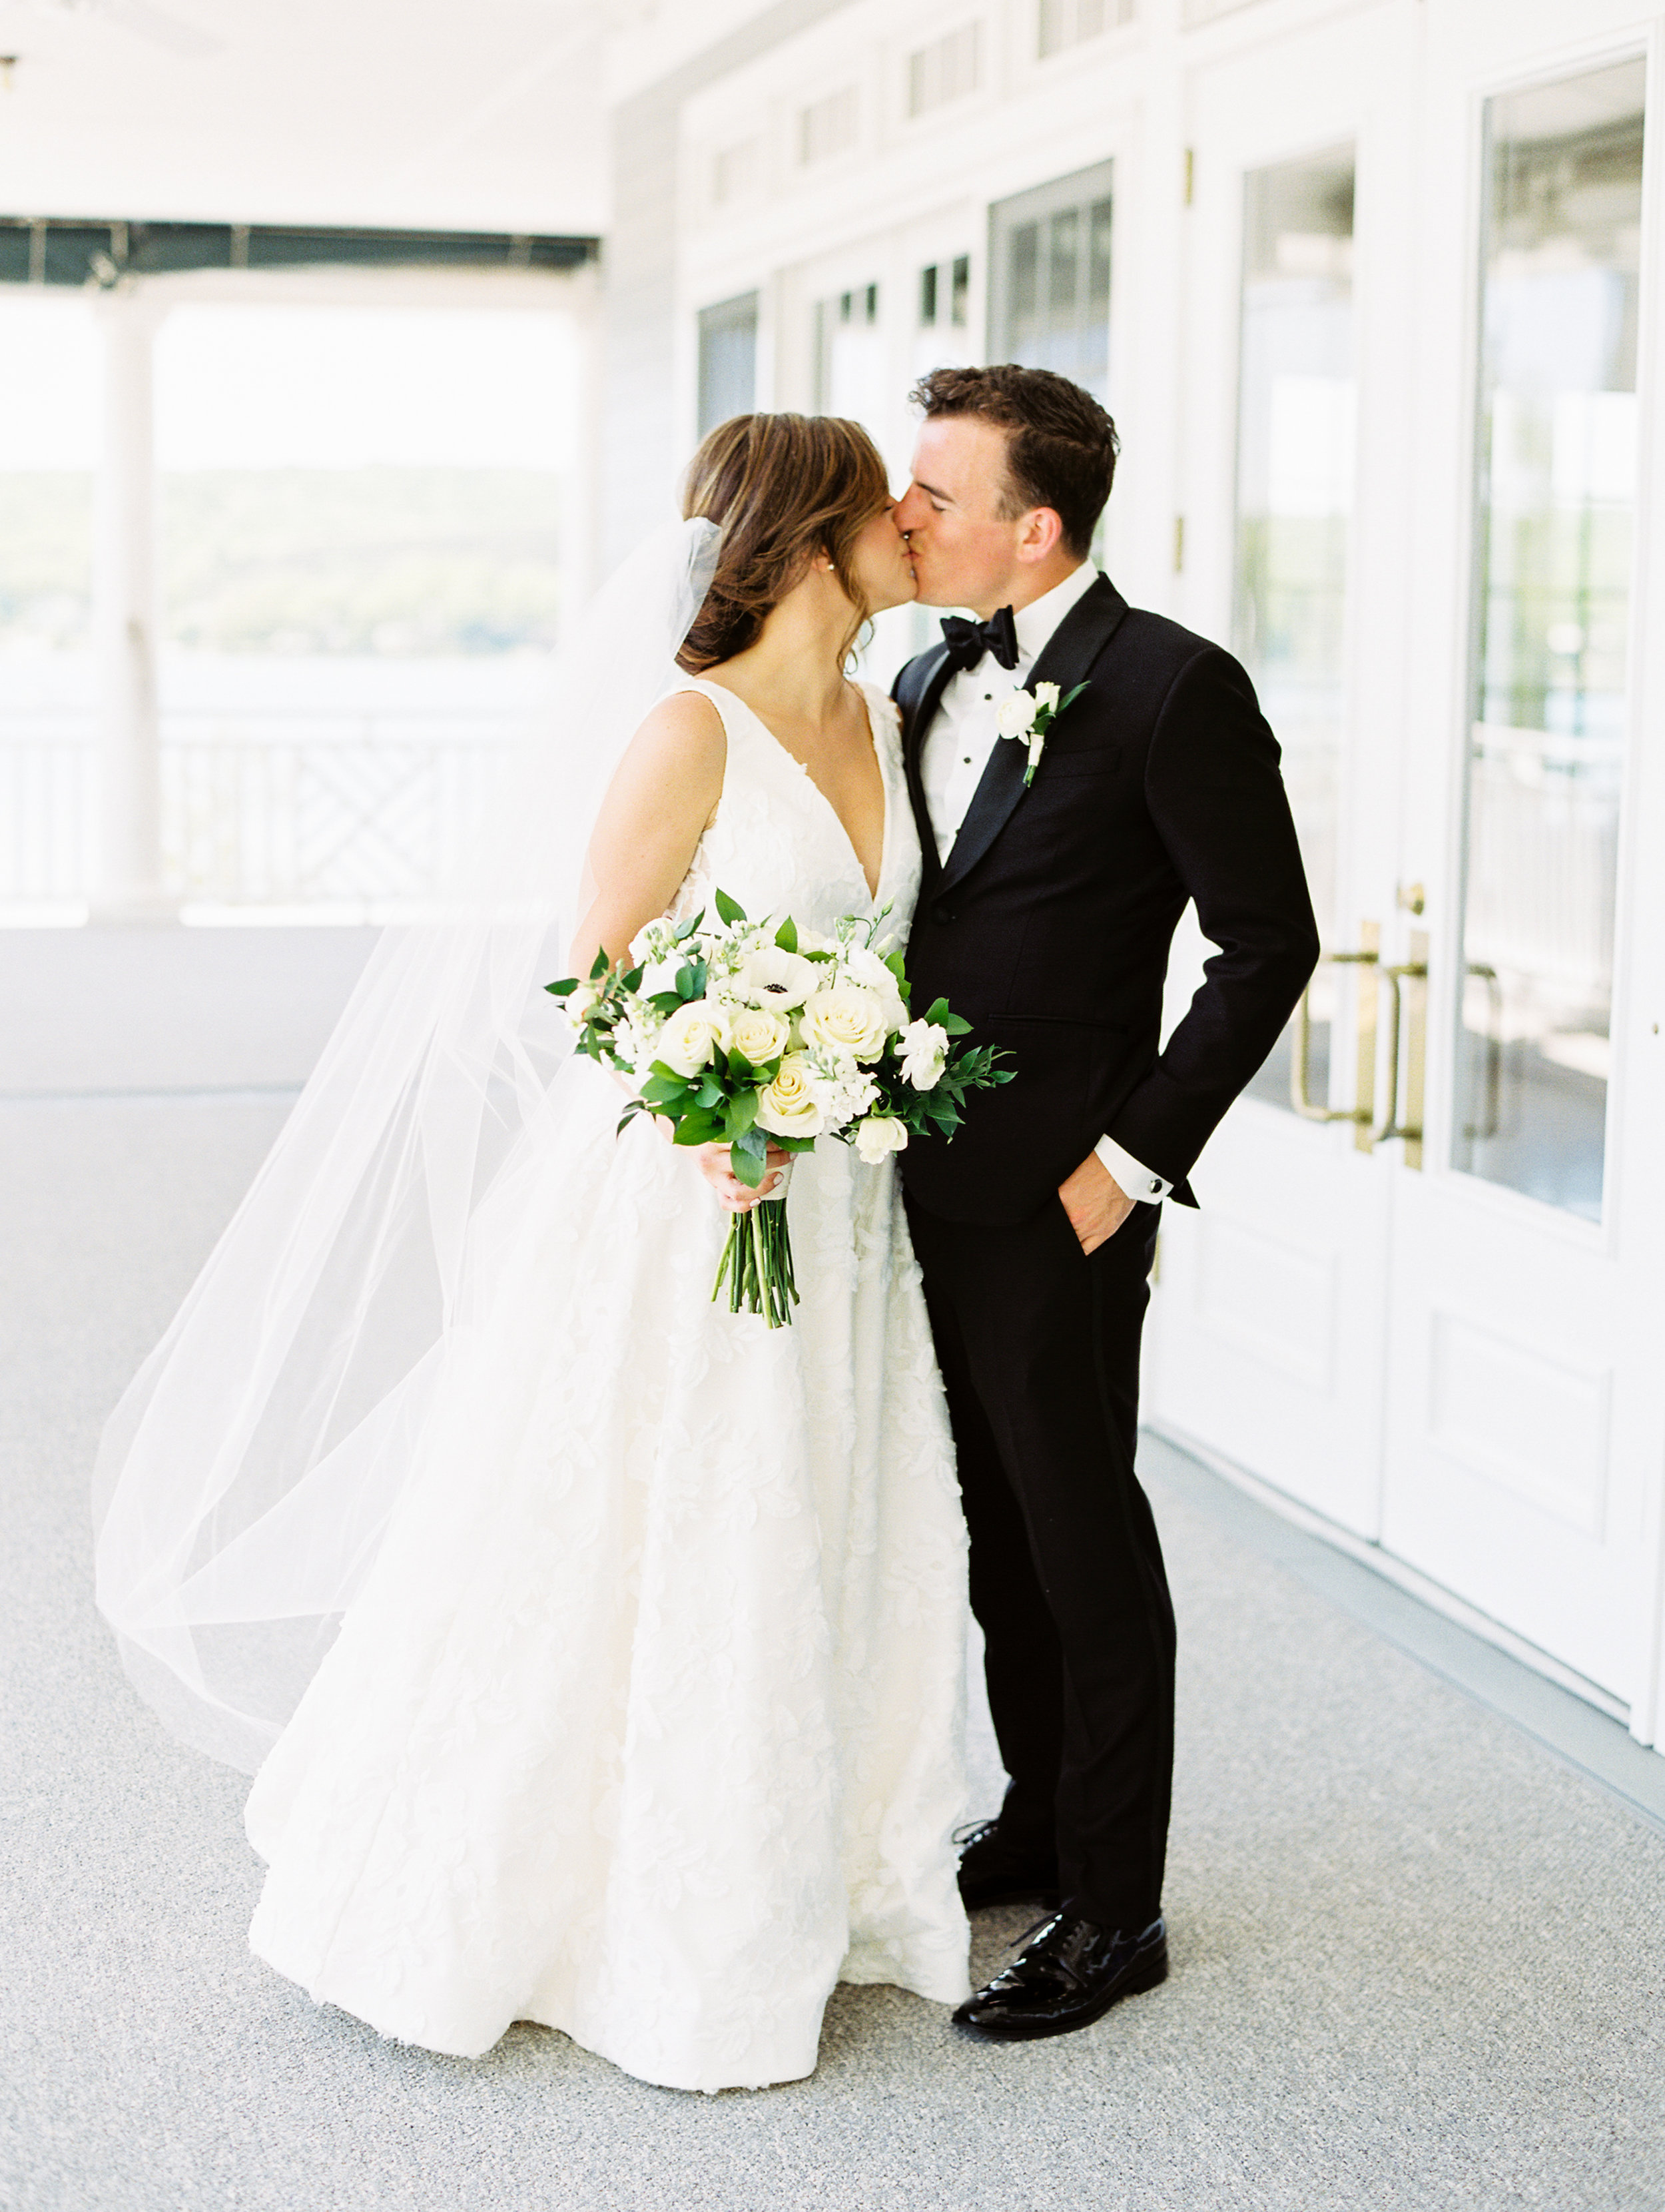 DeGuilio+Wedding+First+Lookf-10 copy.jpg